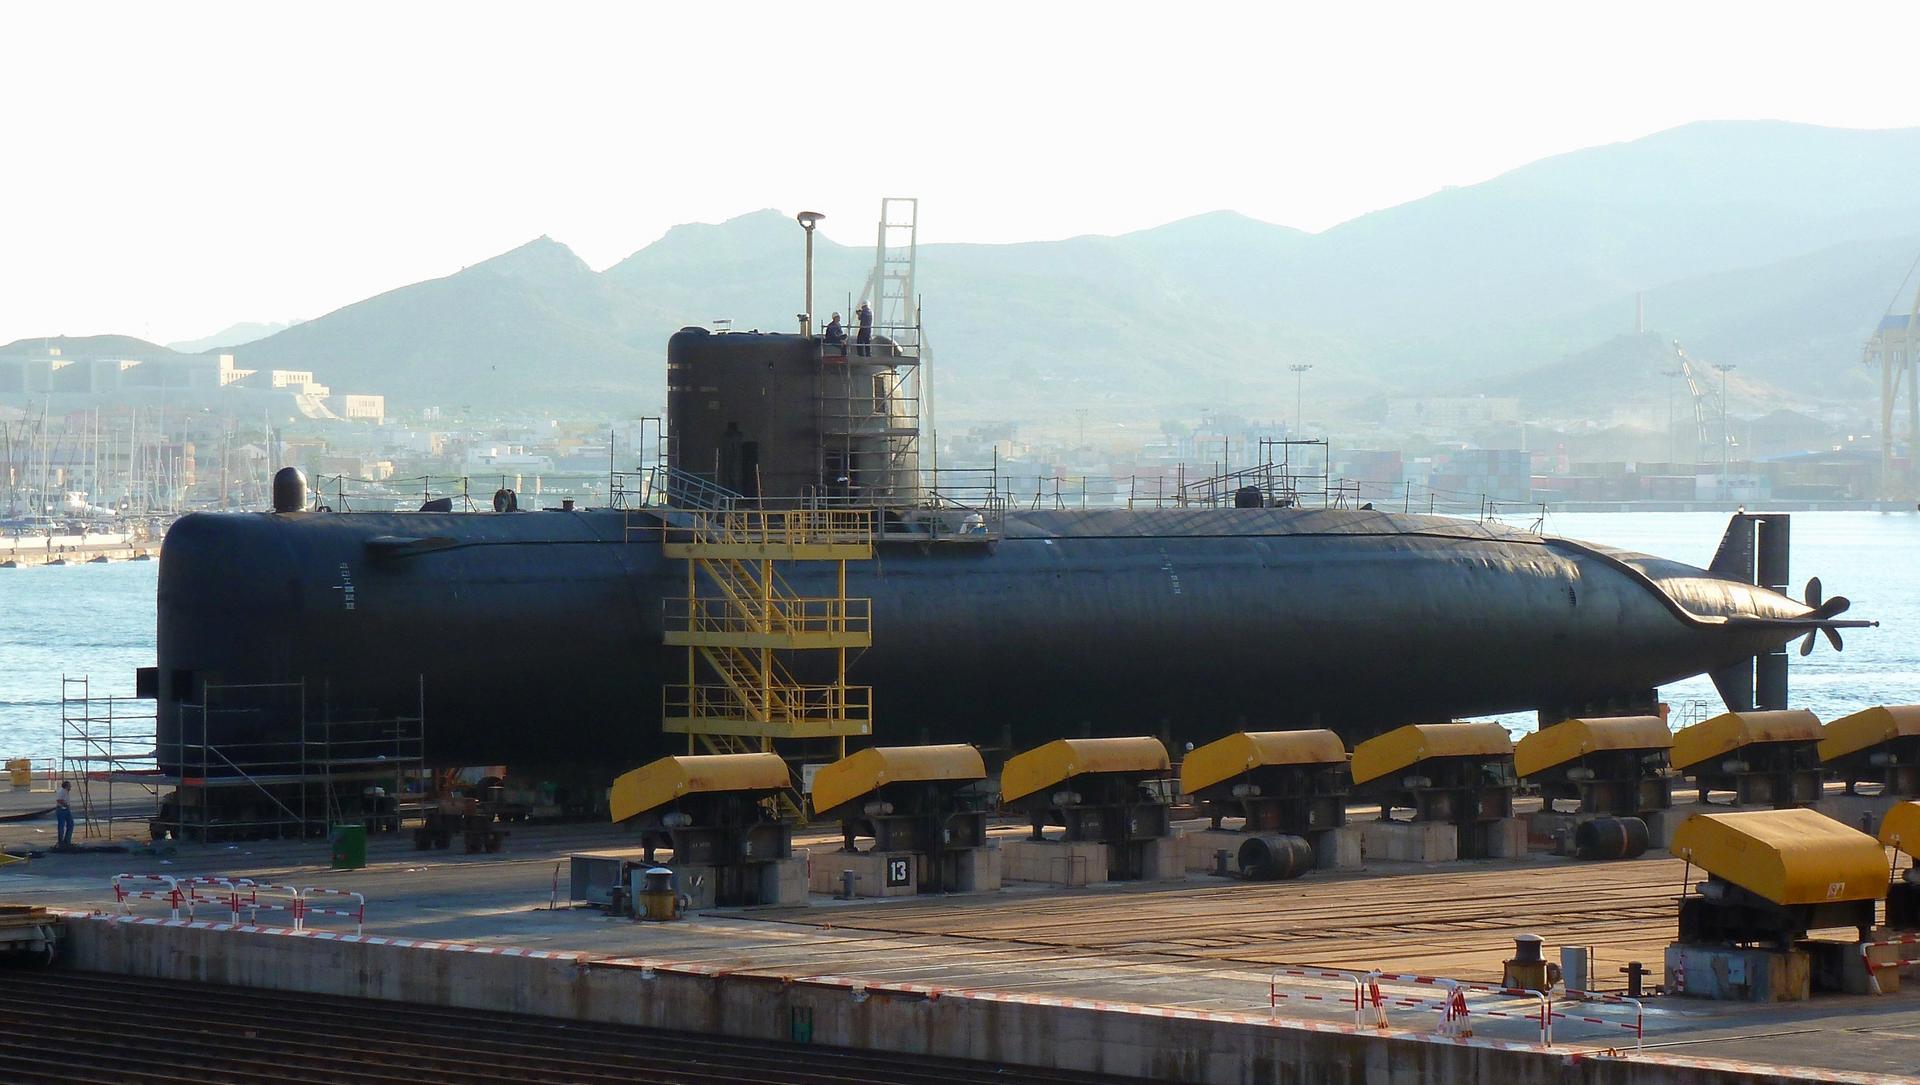 Submarino español S-73 Mistral  - Sputnik Mundo, 1920, 17.02.2020